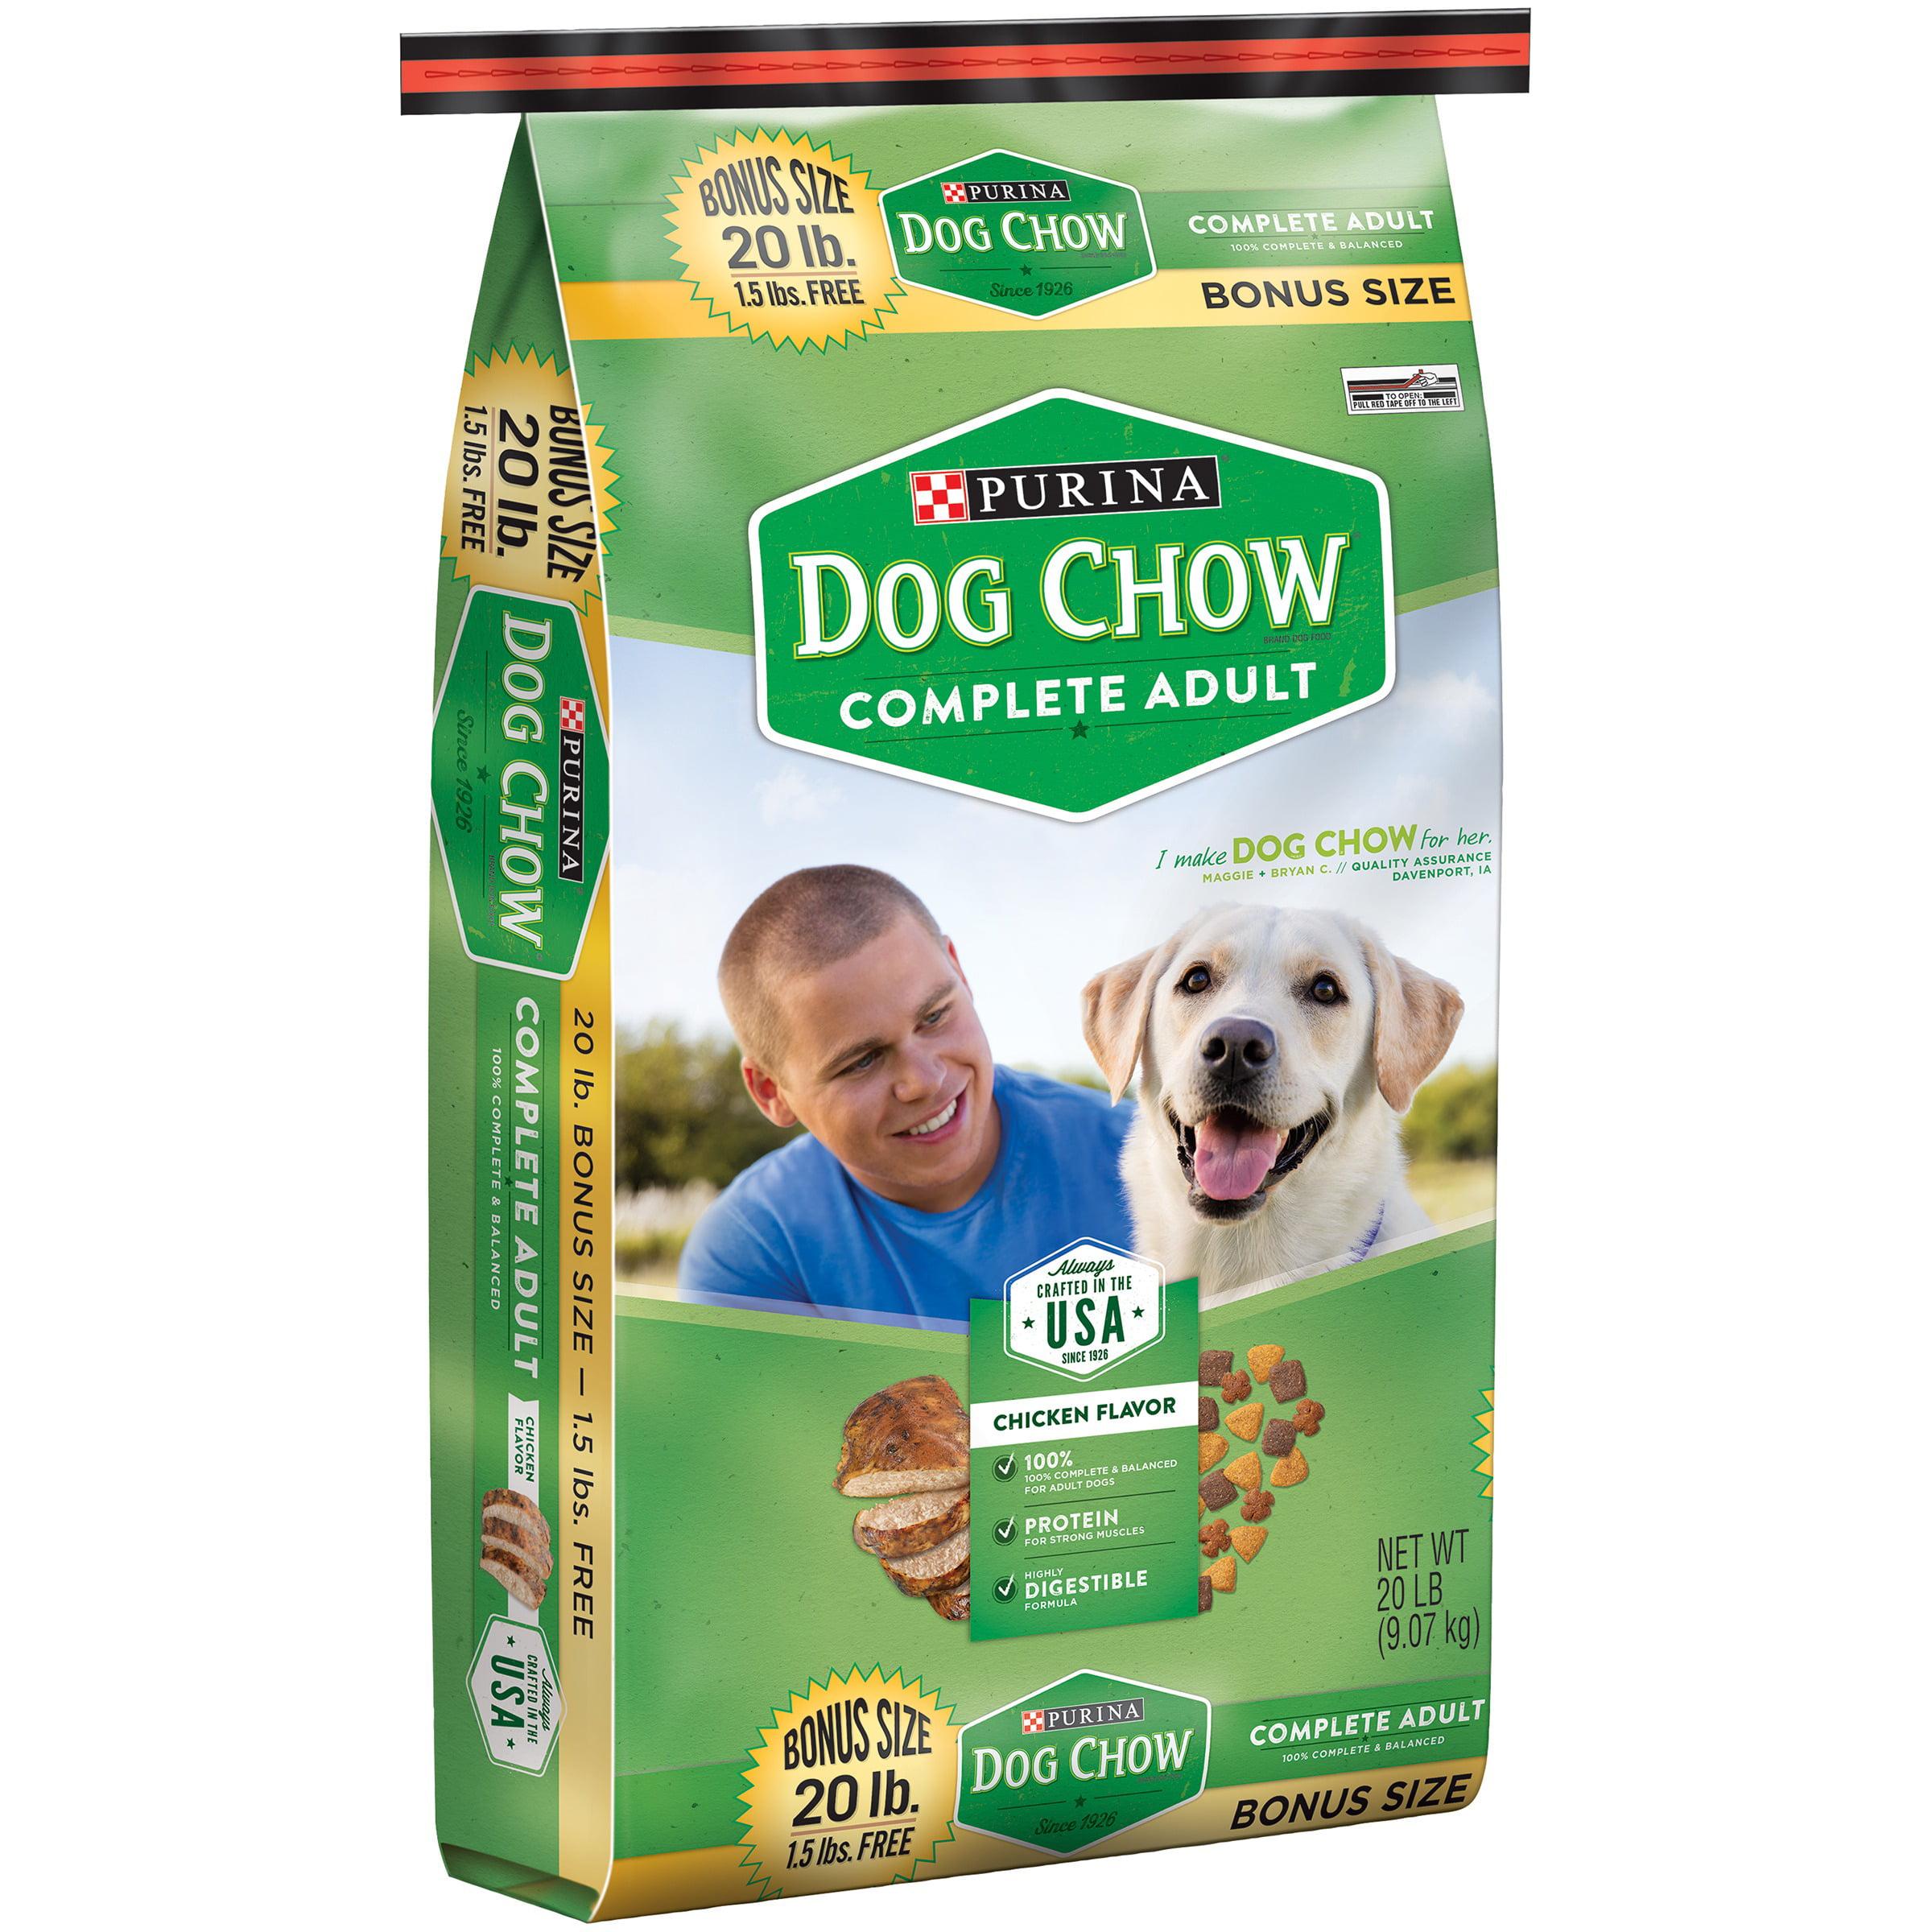 Purina Dog Chow Complete Adult Dog Food 20 lb. Bonus Bag